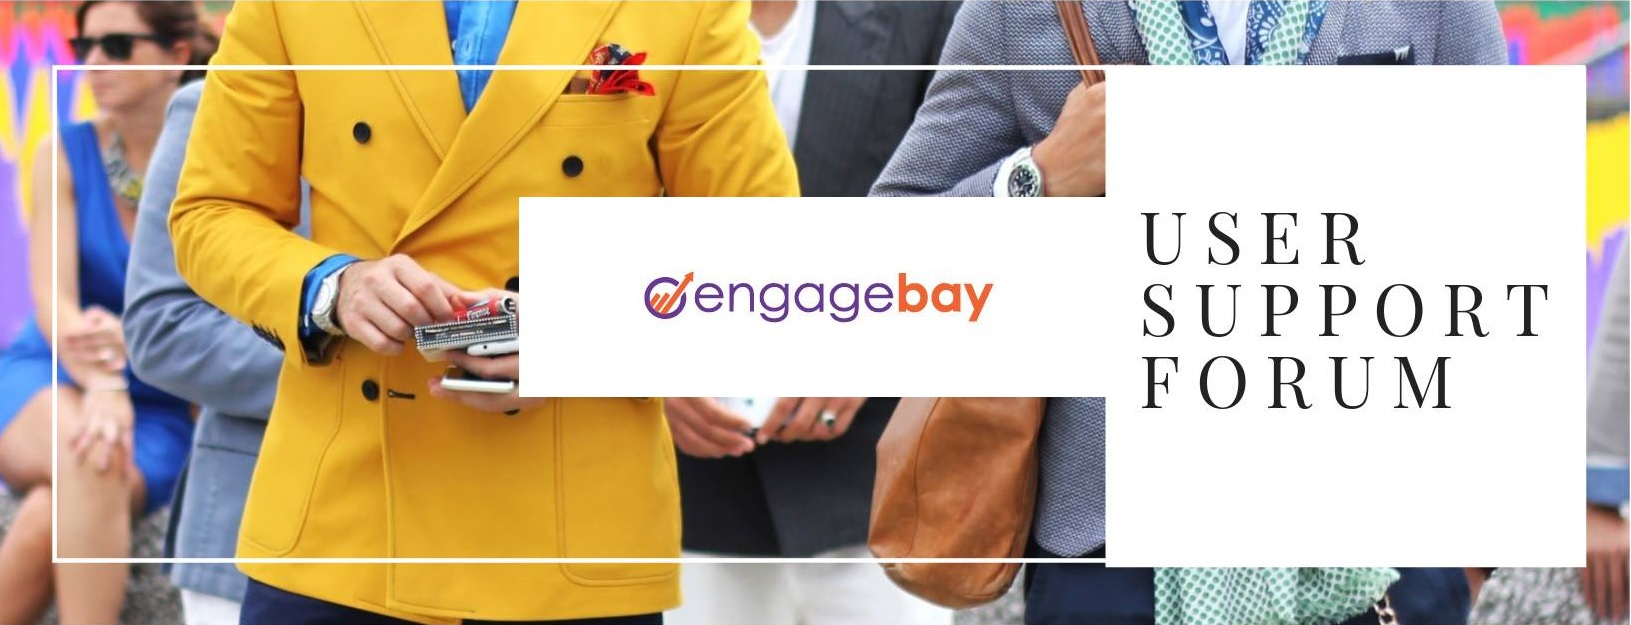 Engagebay FB Group;